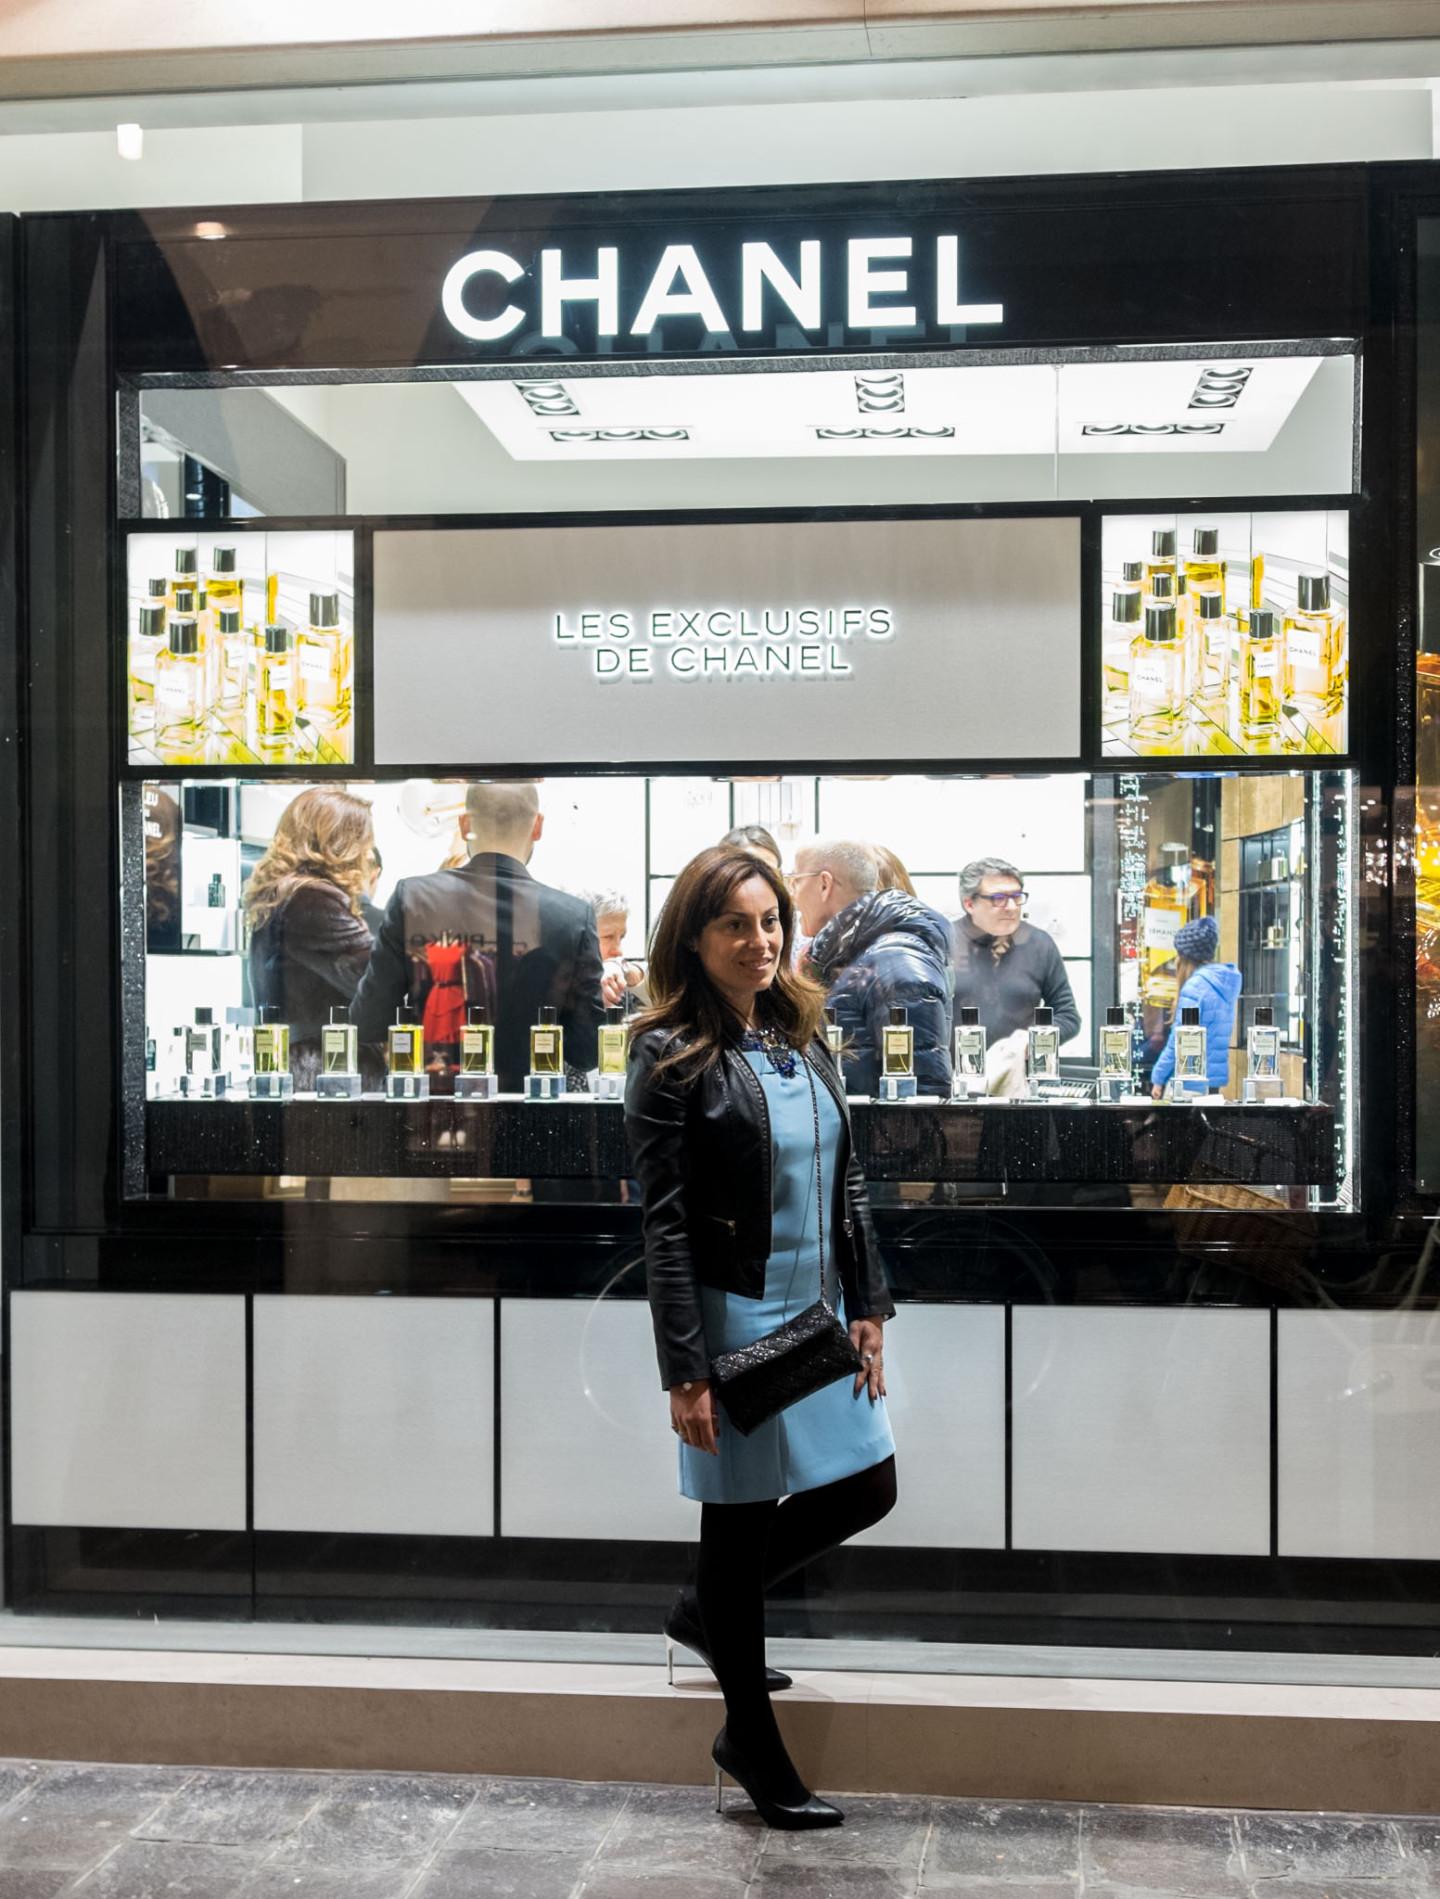 mantova-mirem-profumeria-valentina-coco-fashion-blogger-chanel-nuovo-corner